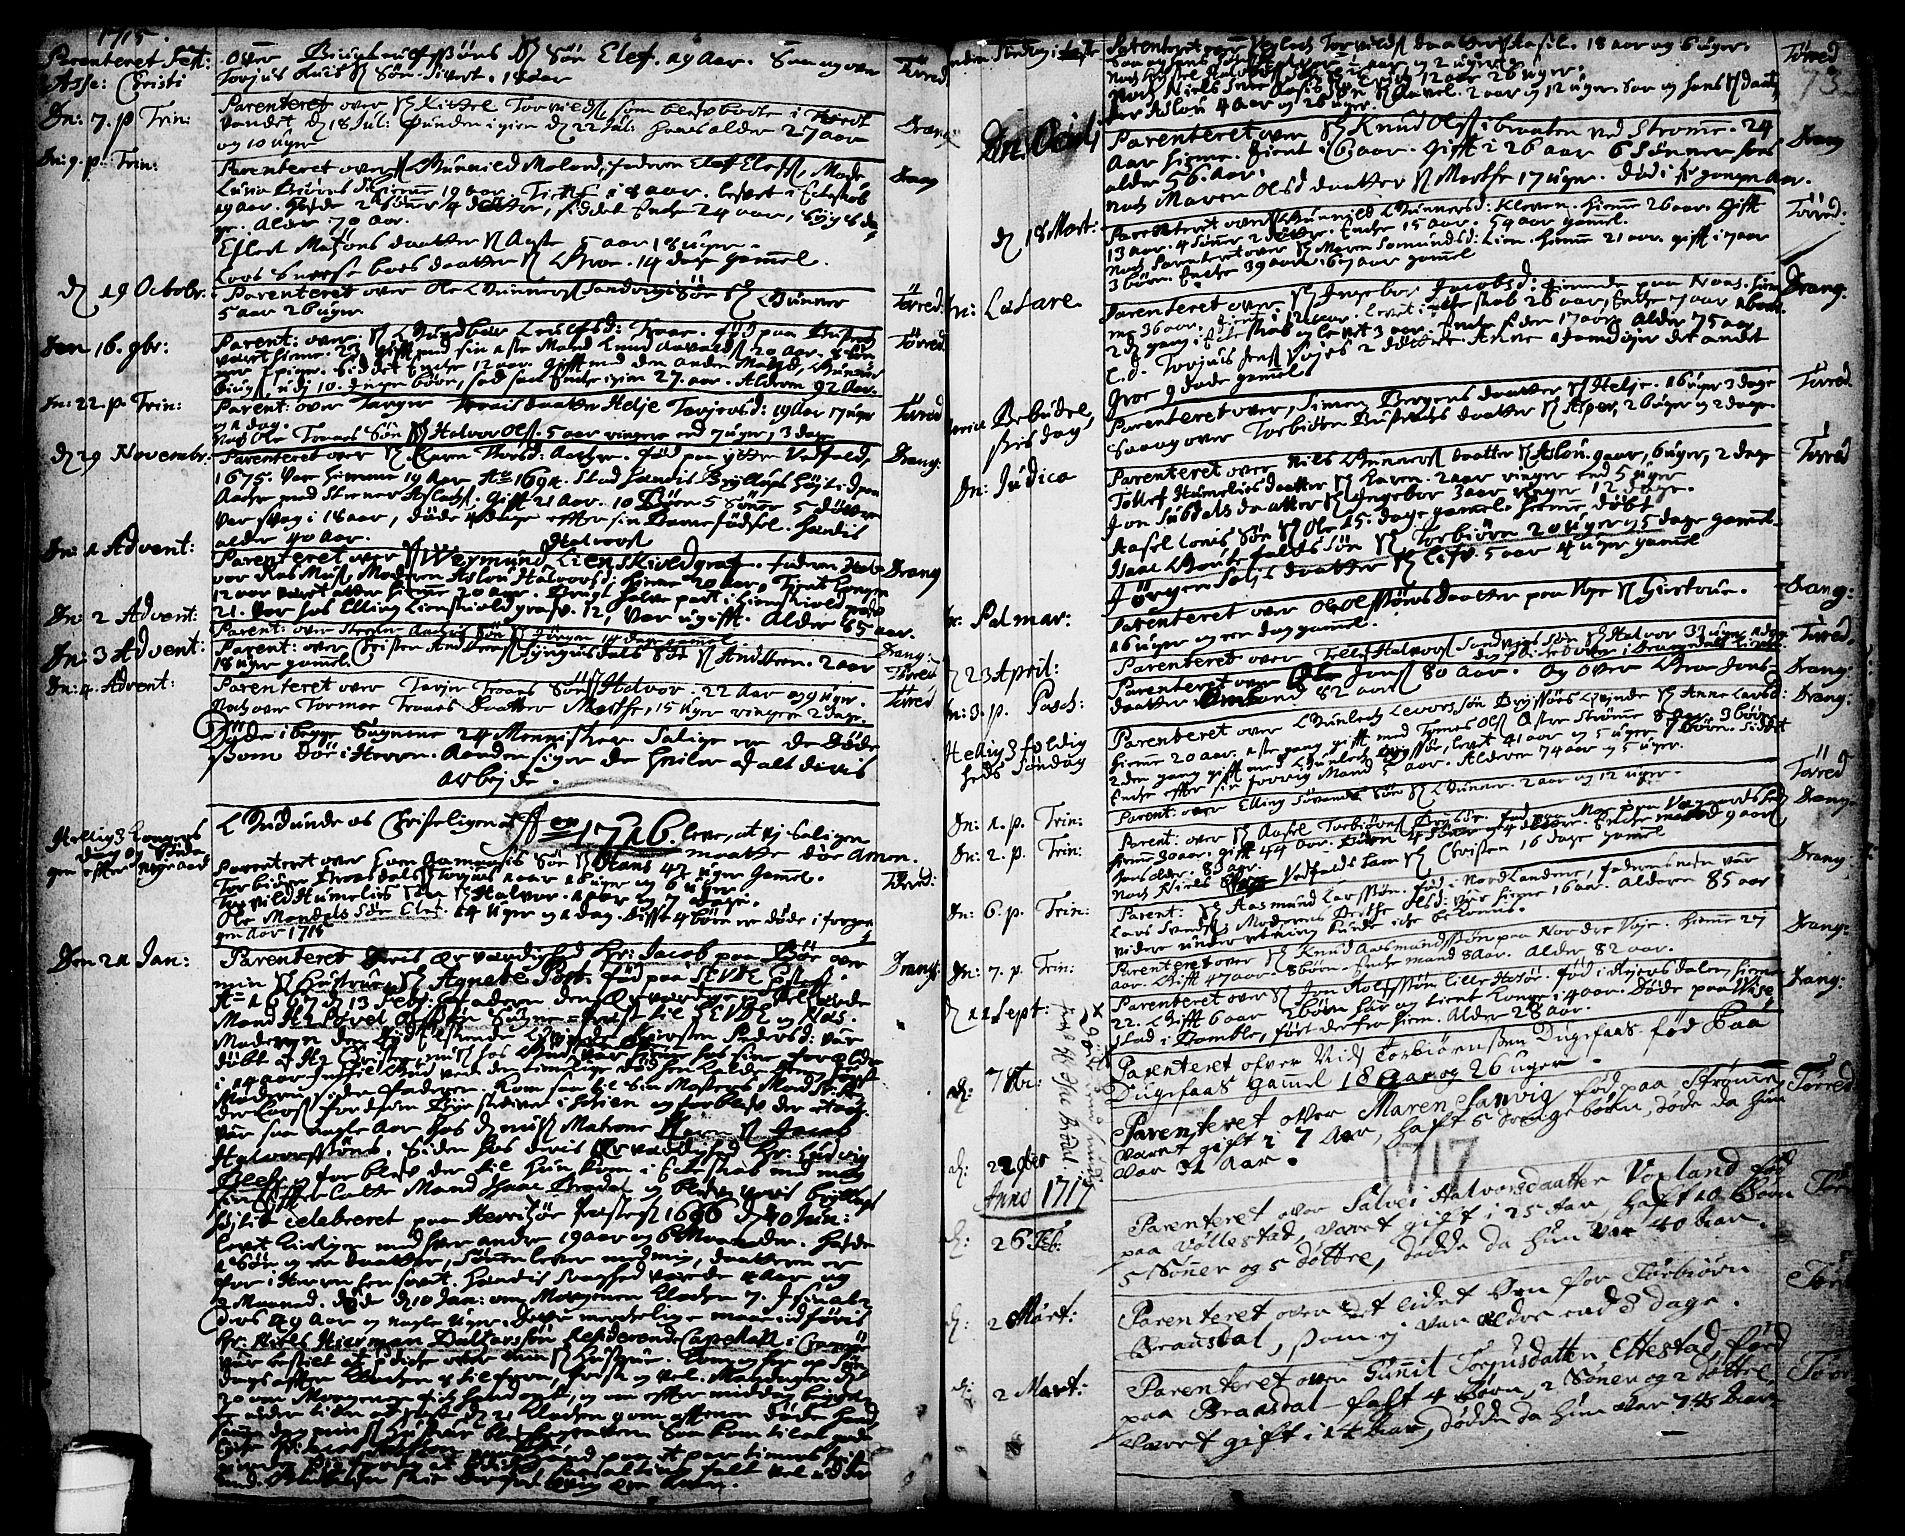 SAKO, Drangedal kirkebøker, F/Fa/L0001: Ministerialbok nr. 1, 1697-1767, s. 73